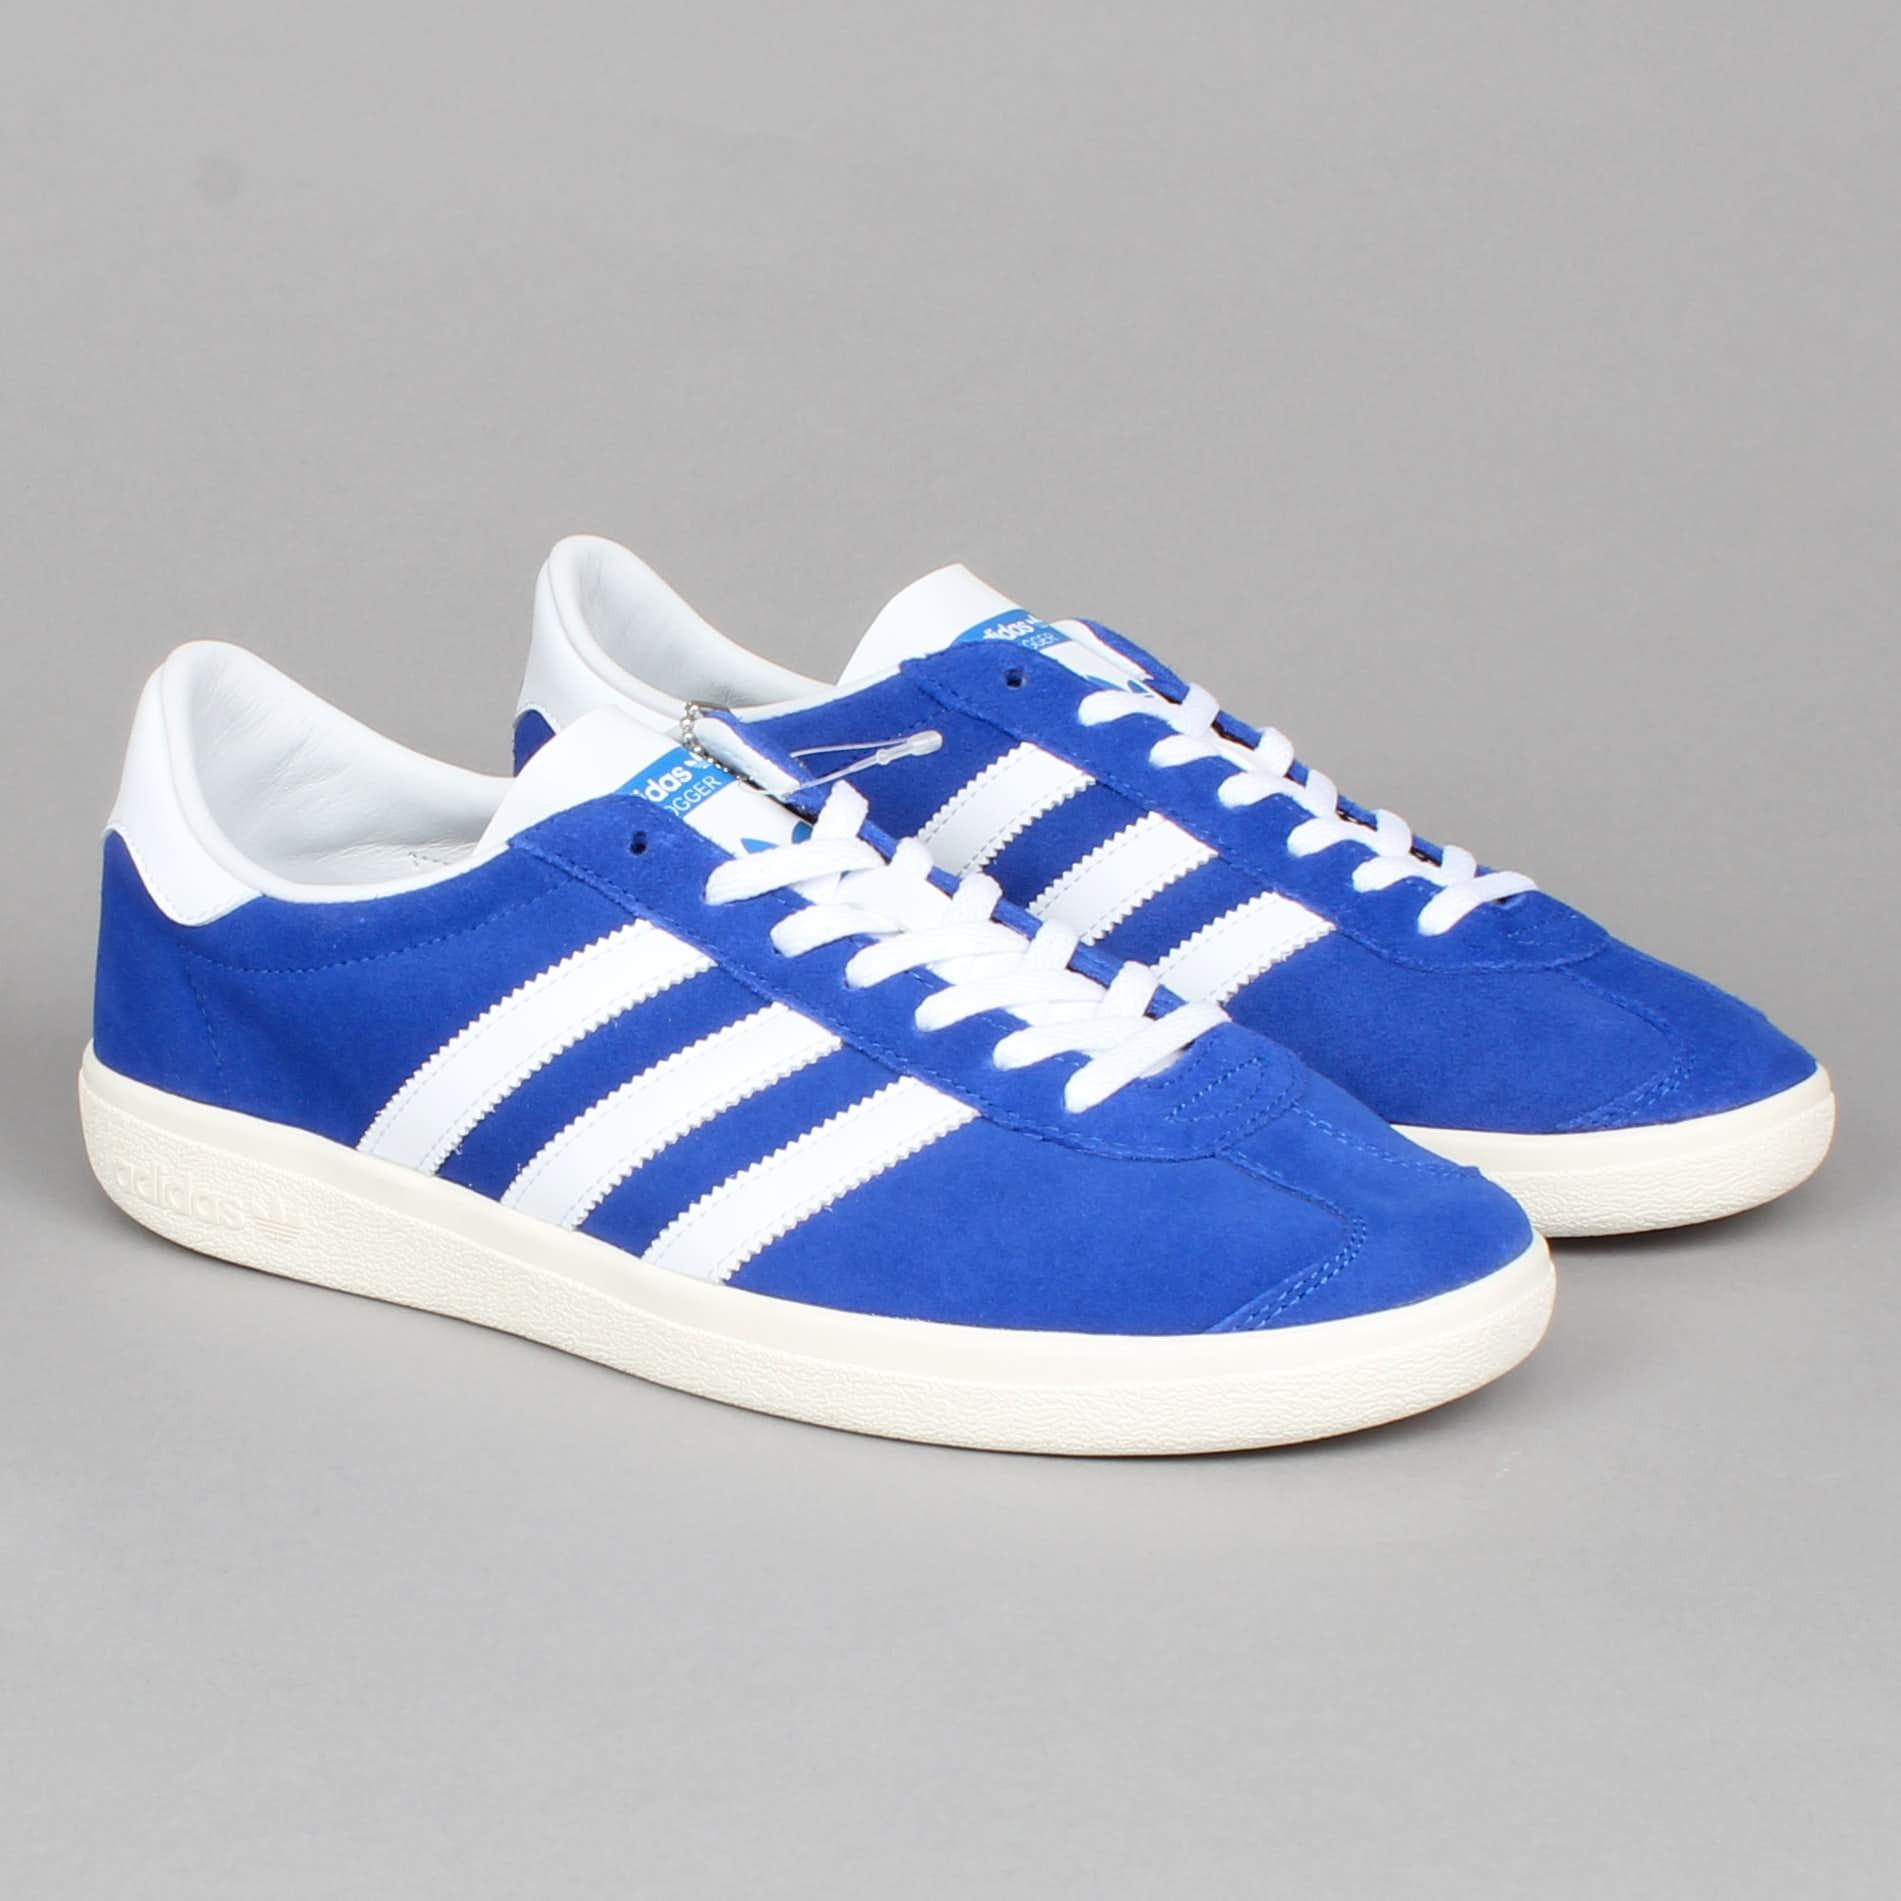 ADIDAS JOGGER SPZL BLUE/WHITE  900 DKK